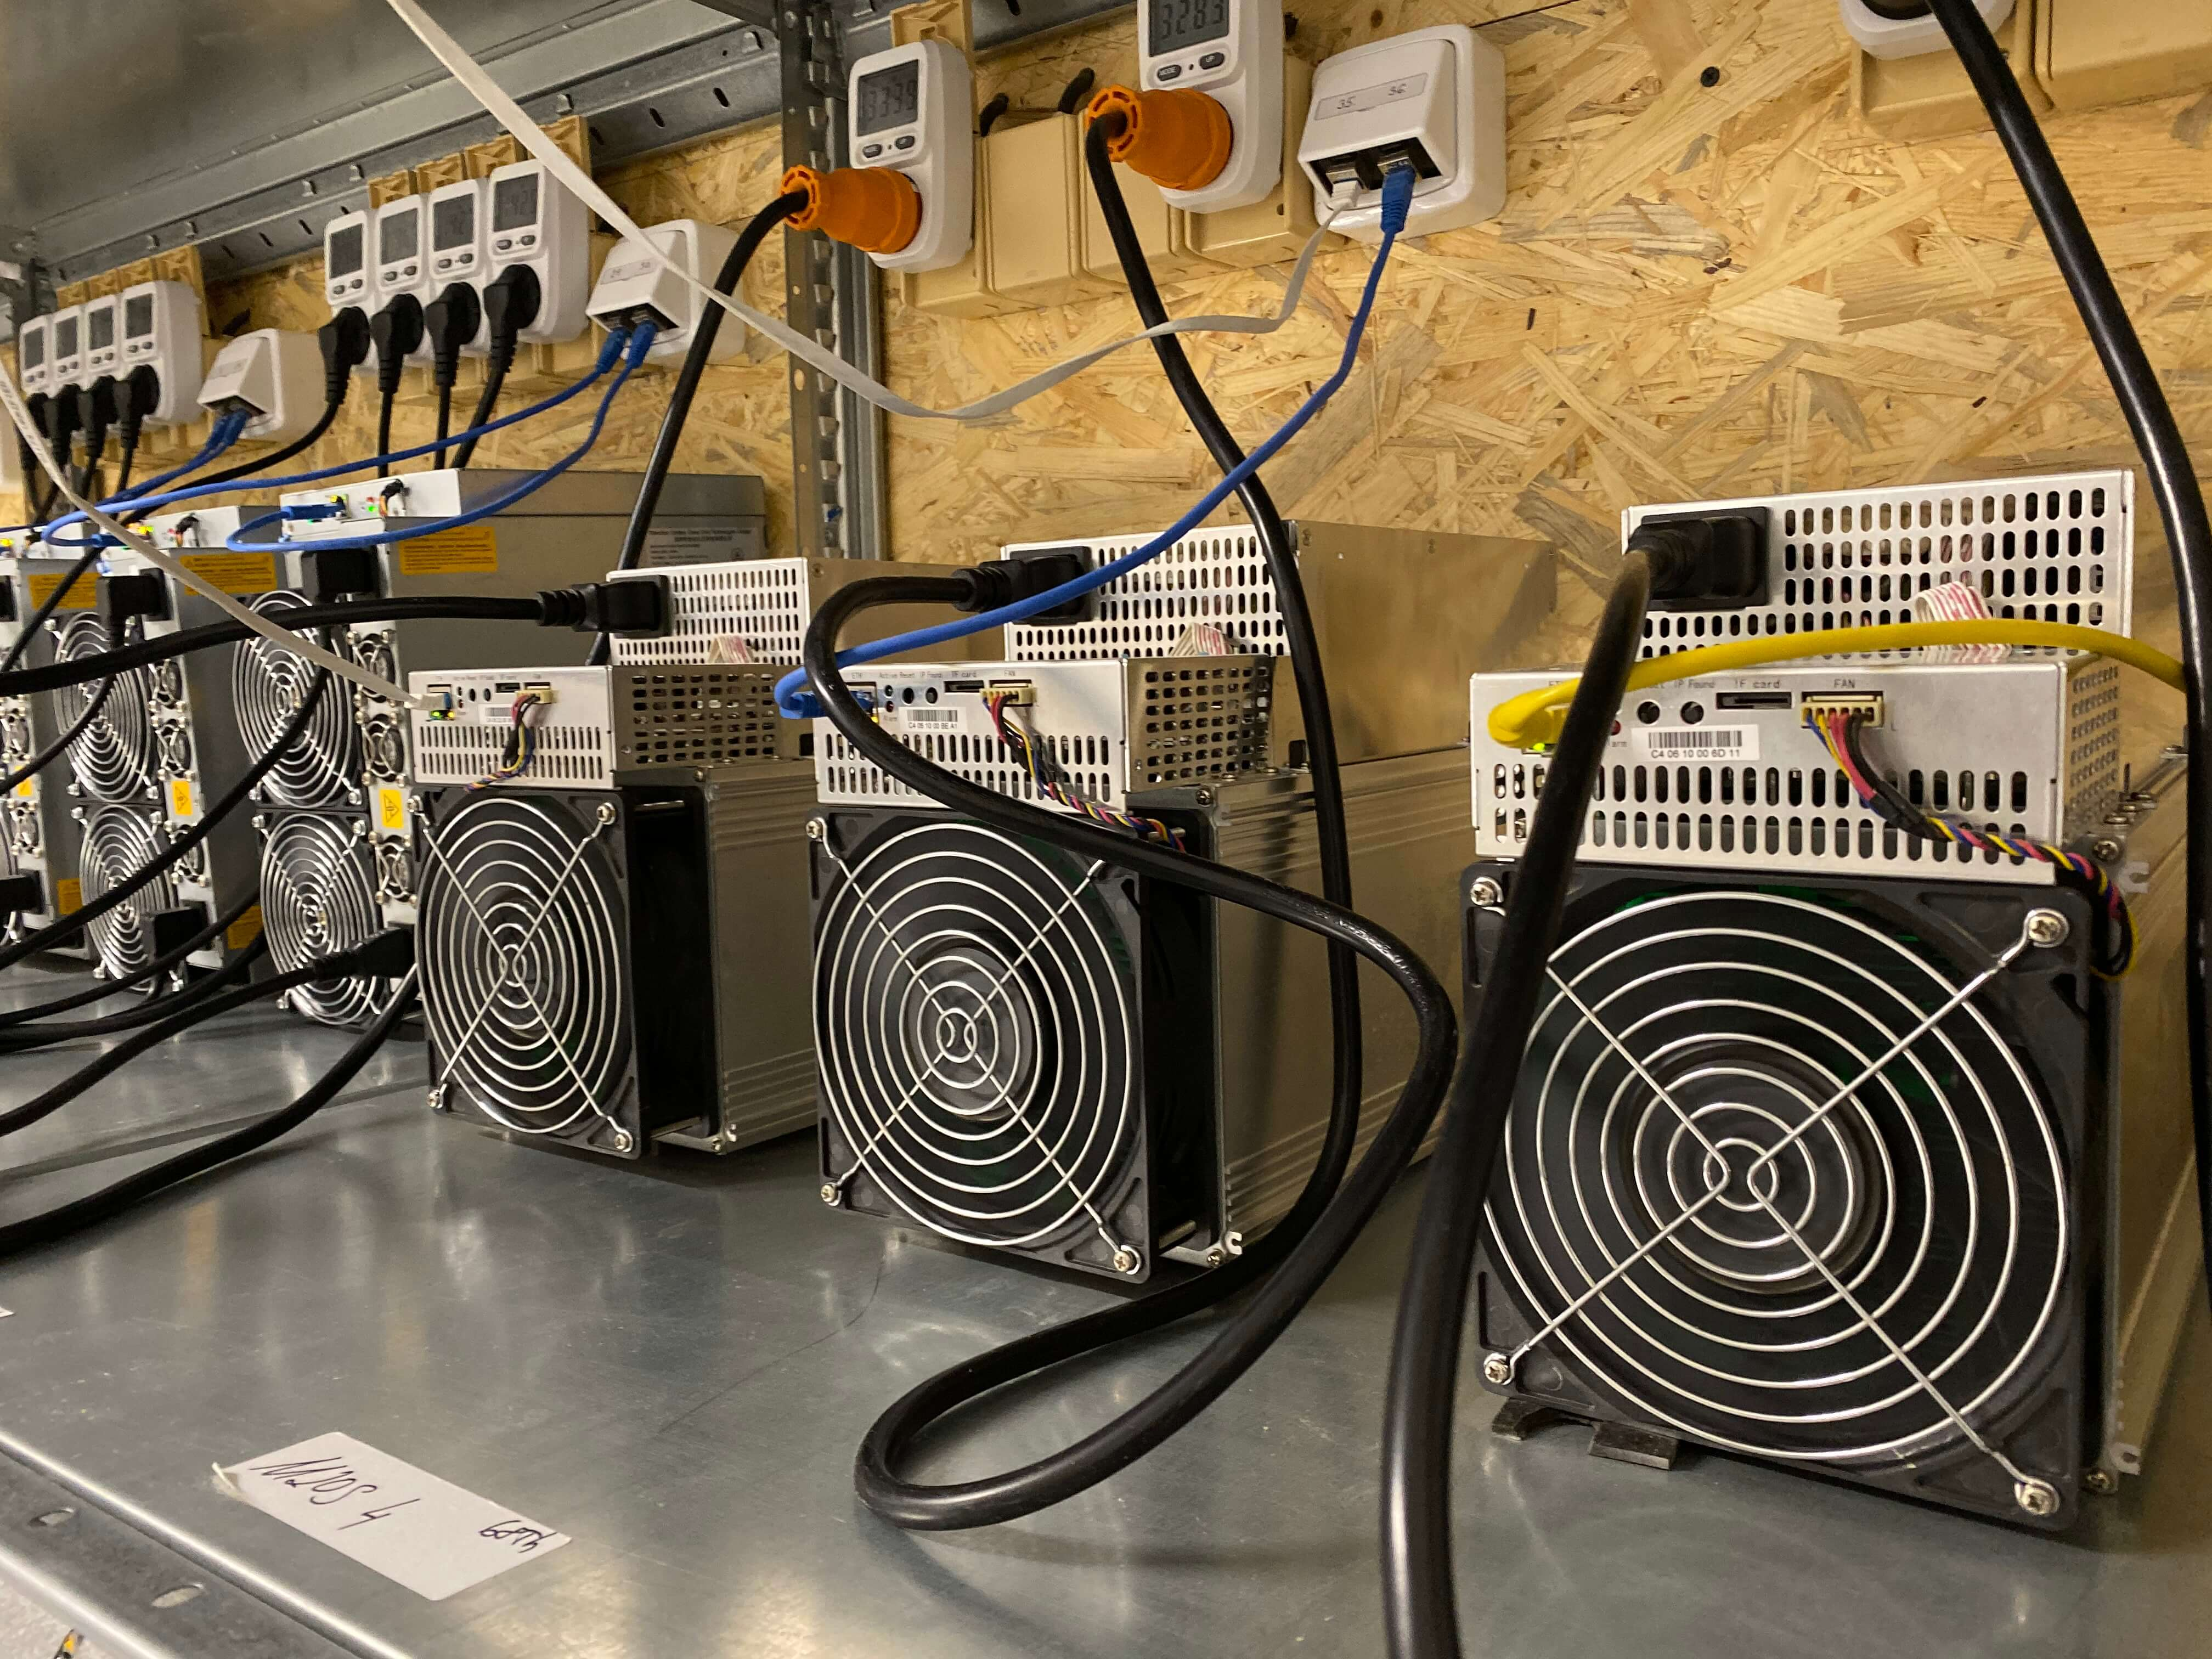 Mining bitcoins tutorial elite dangerous imperial cutter mining bitcoins